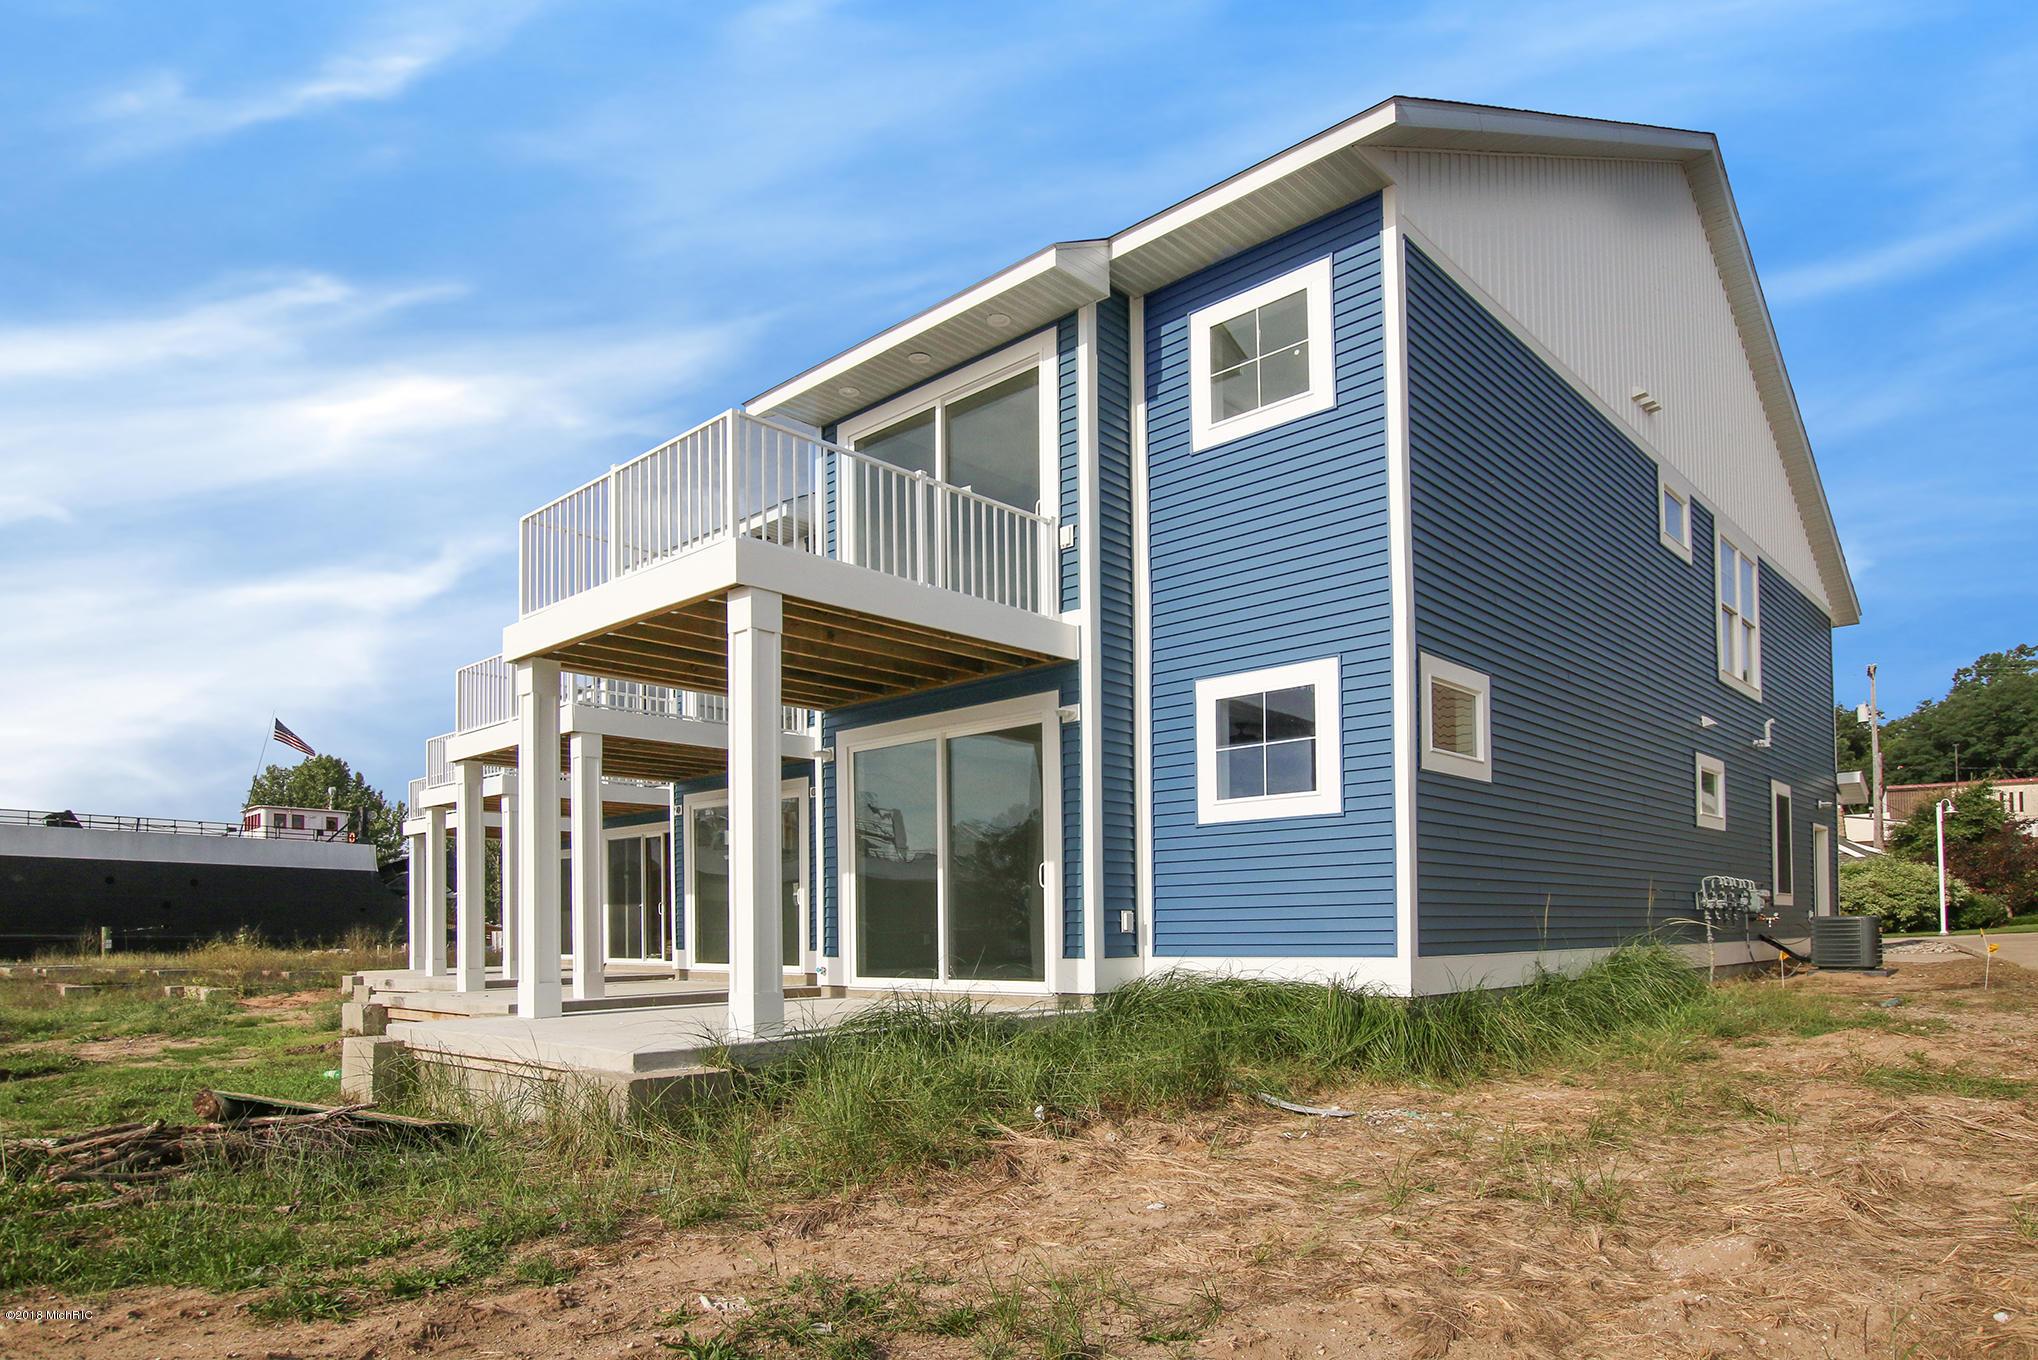 129 Joslin Cove Drive, #129, Manistee, MI 49660, MLS # 18007636   Jaqua  Realtors